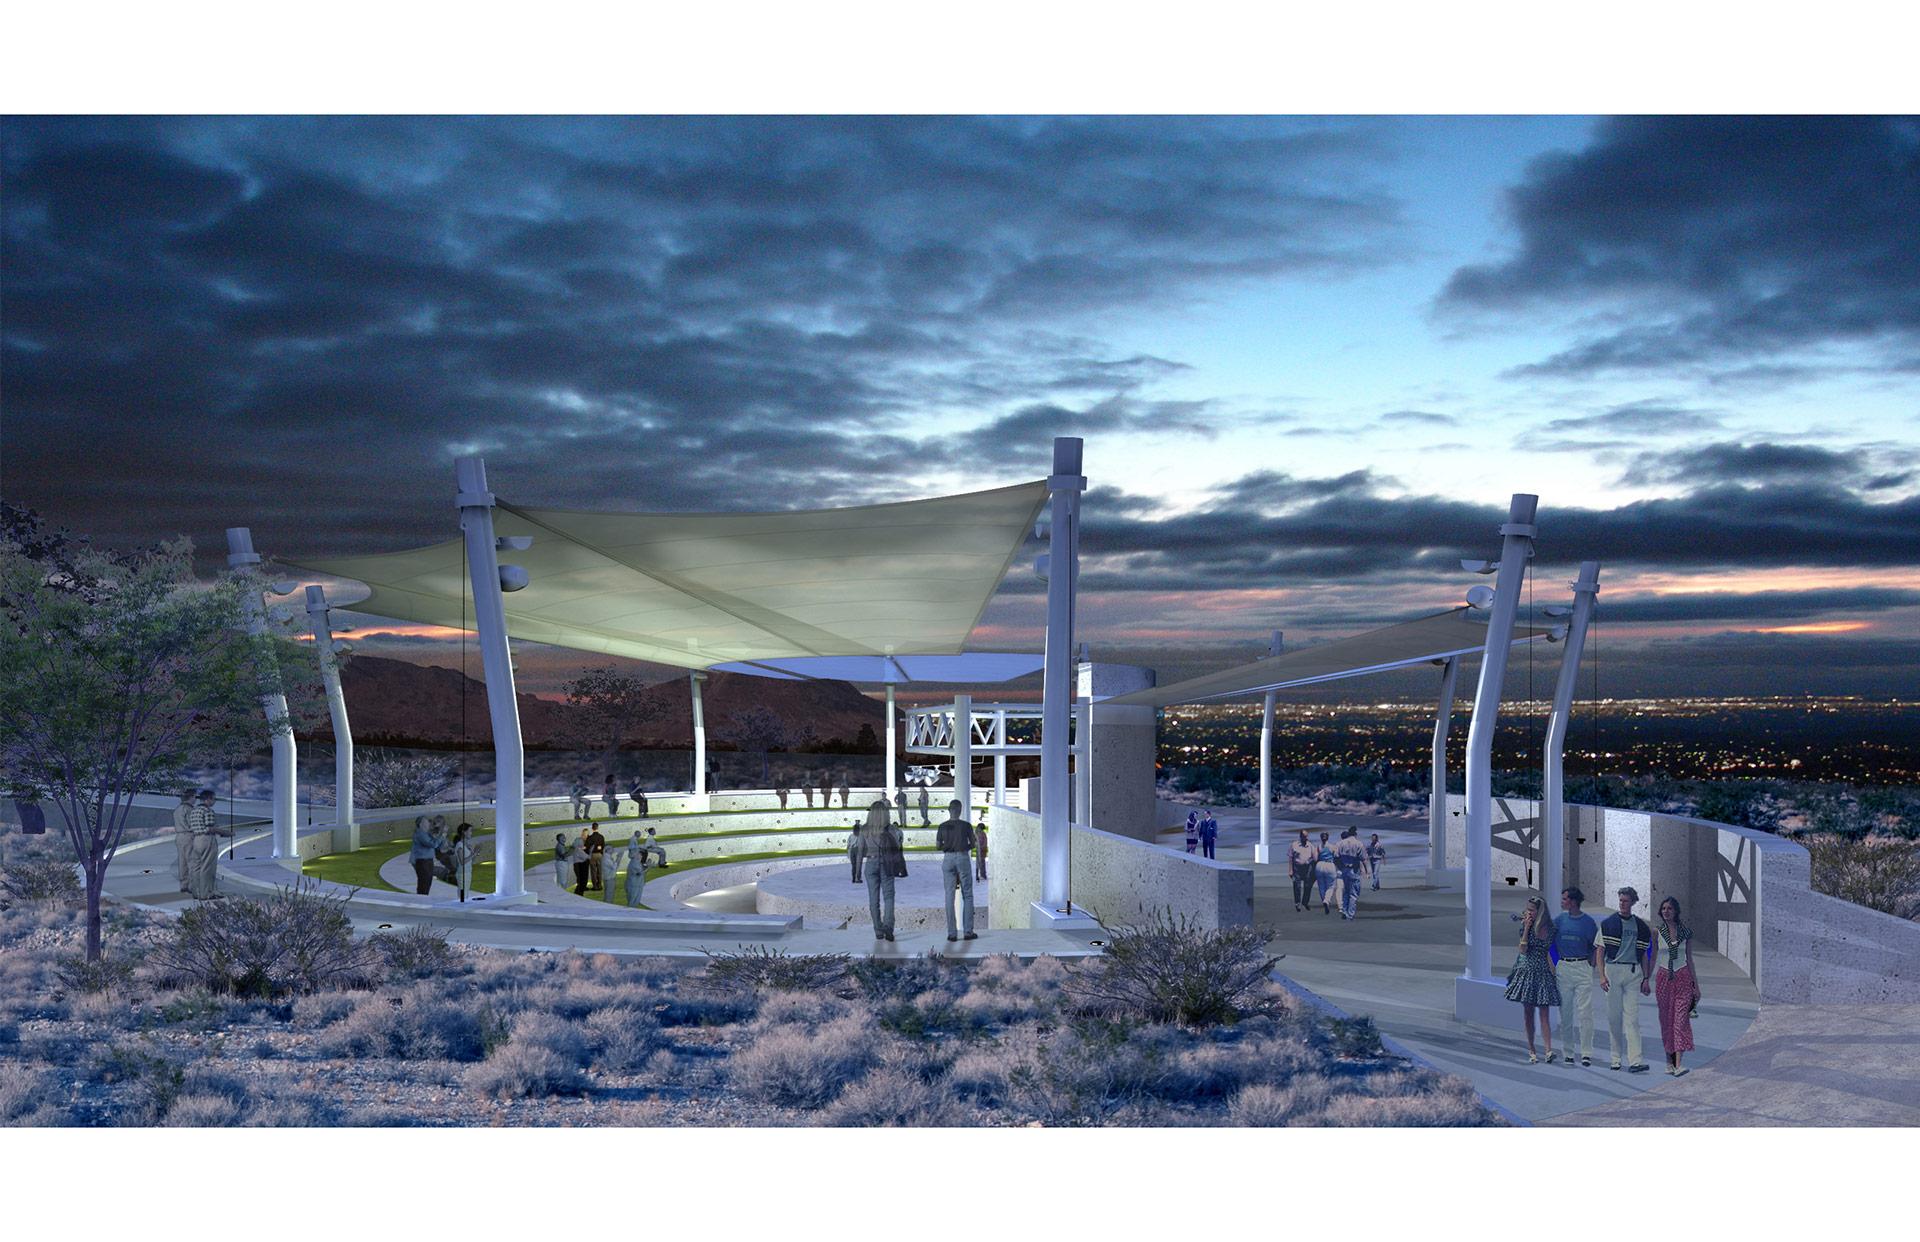 Nevada State College Amphitheater